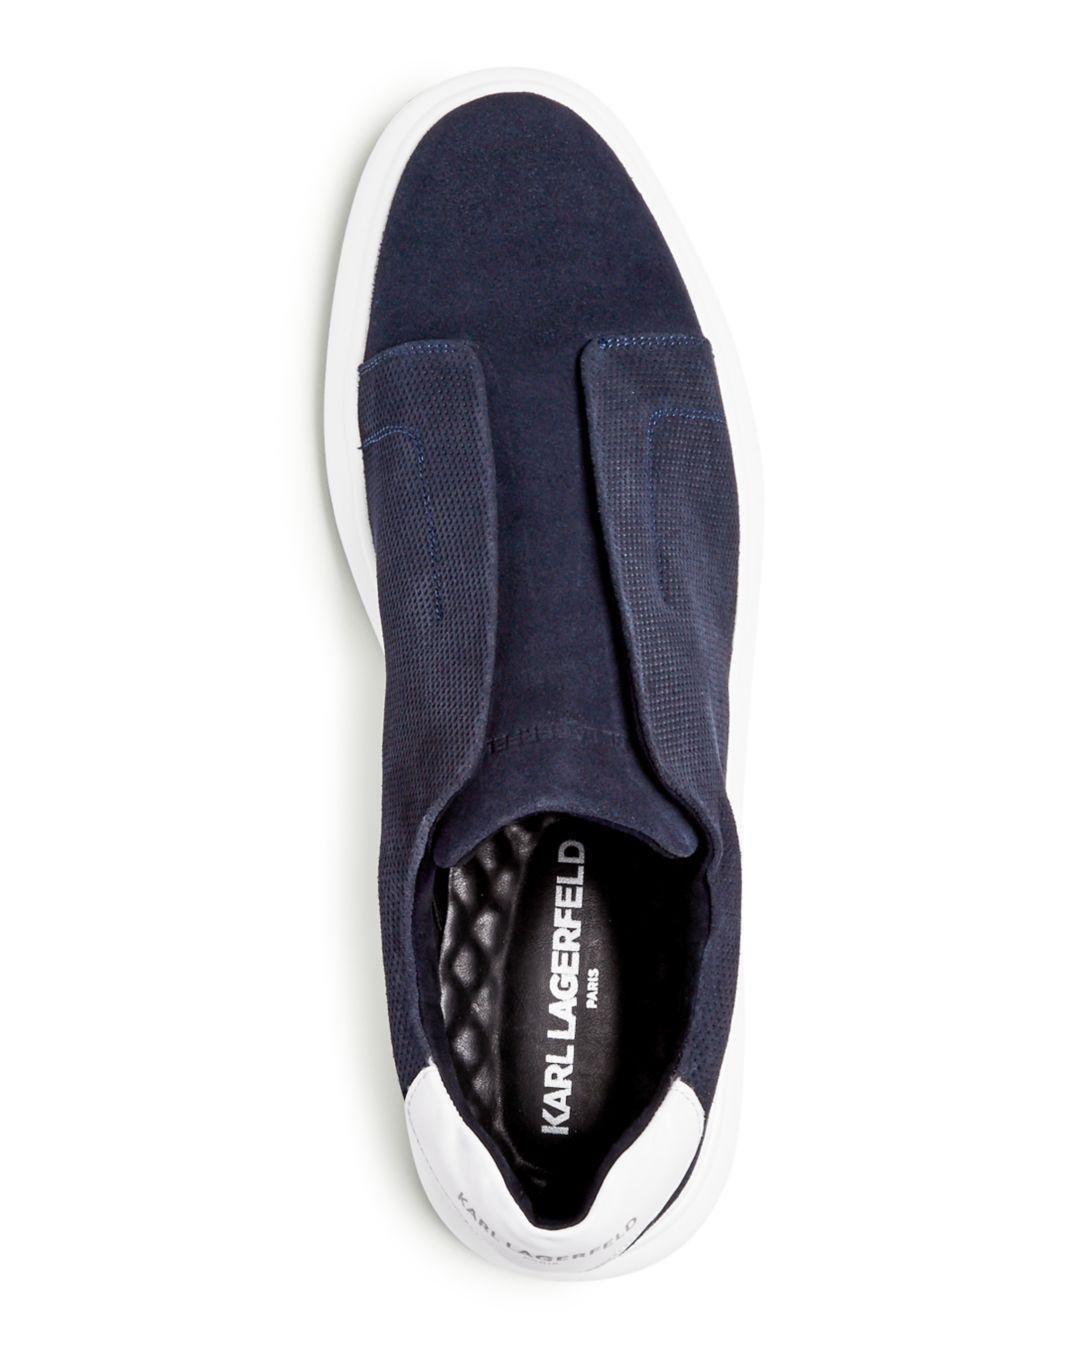 c3e05273be Lyst - Karl Lagerfeld Men s Suede Slip-on Sneakers in Blue for Men